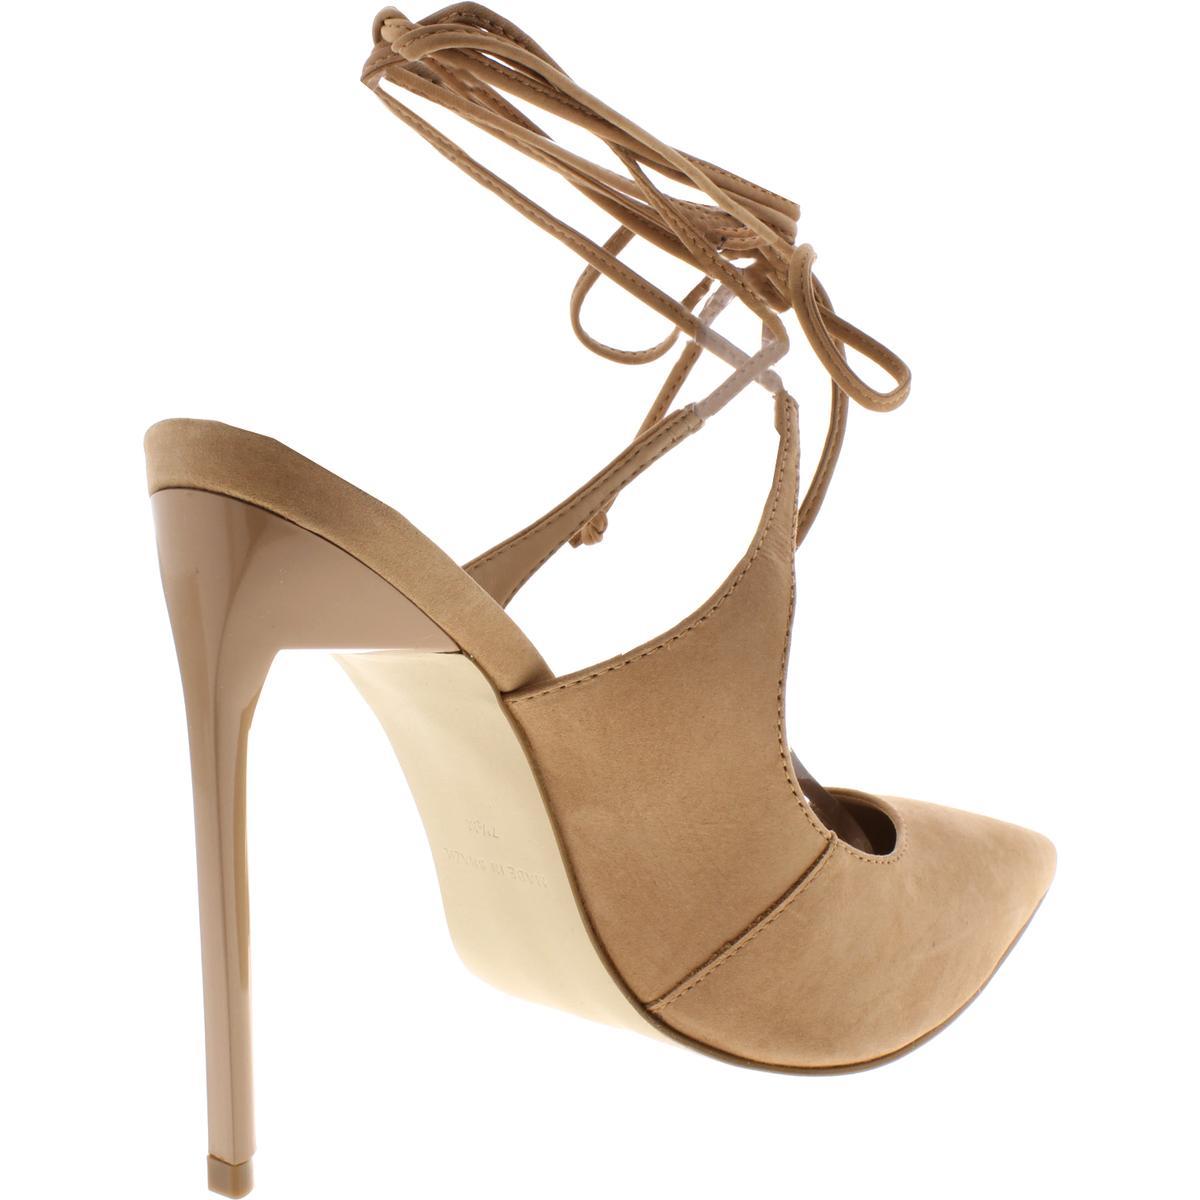 Steve-Madden-Womens-Raven-Nubuck-Ankle-Wrap-Shoes-Mules-Heels-BHFO-1622 thumbnail 8